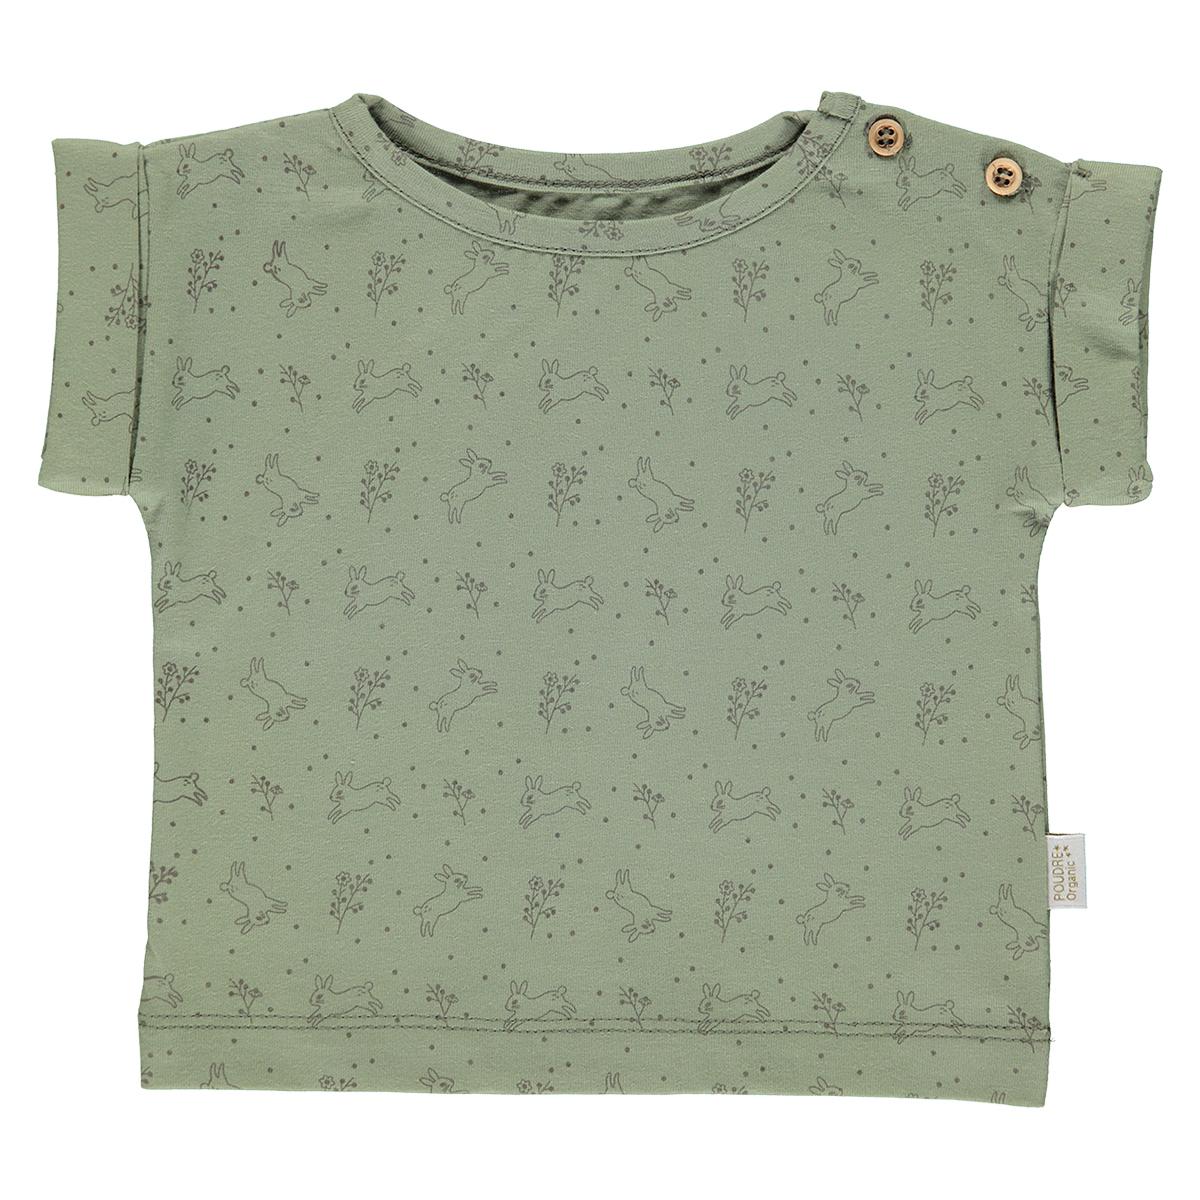 Haut bébé T-Shirt Bourrache Oil Green et Motifs - 18 Mois T-Shirt Bourrache Oil Green et Motifs - 18 Mois